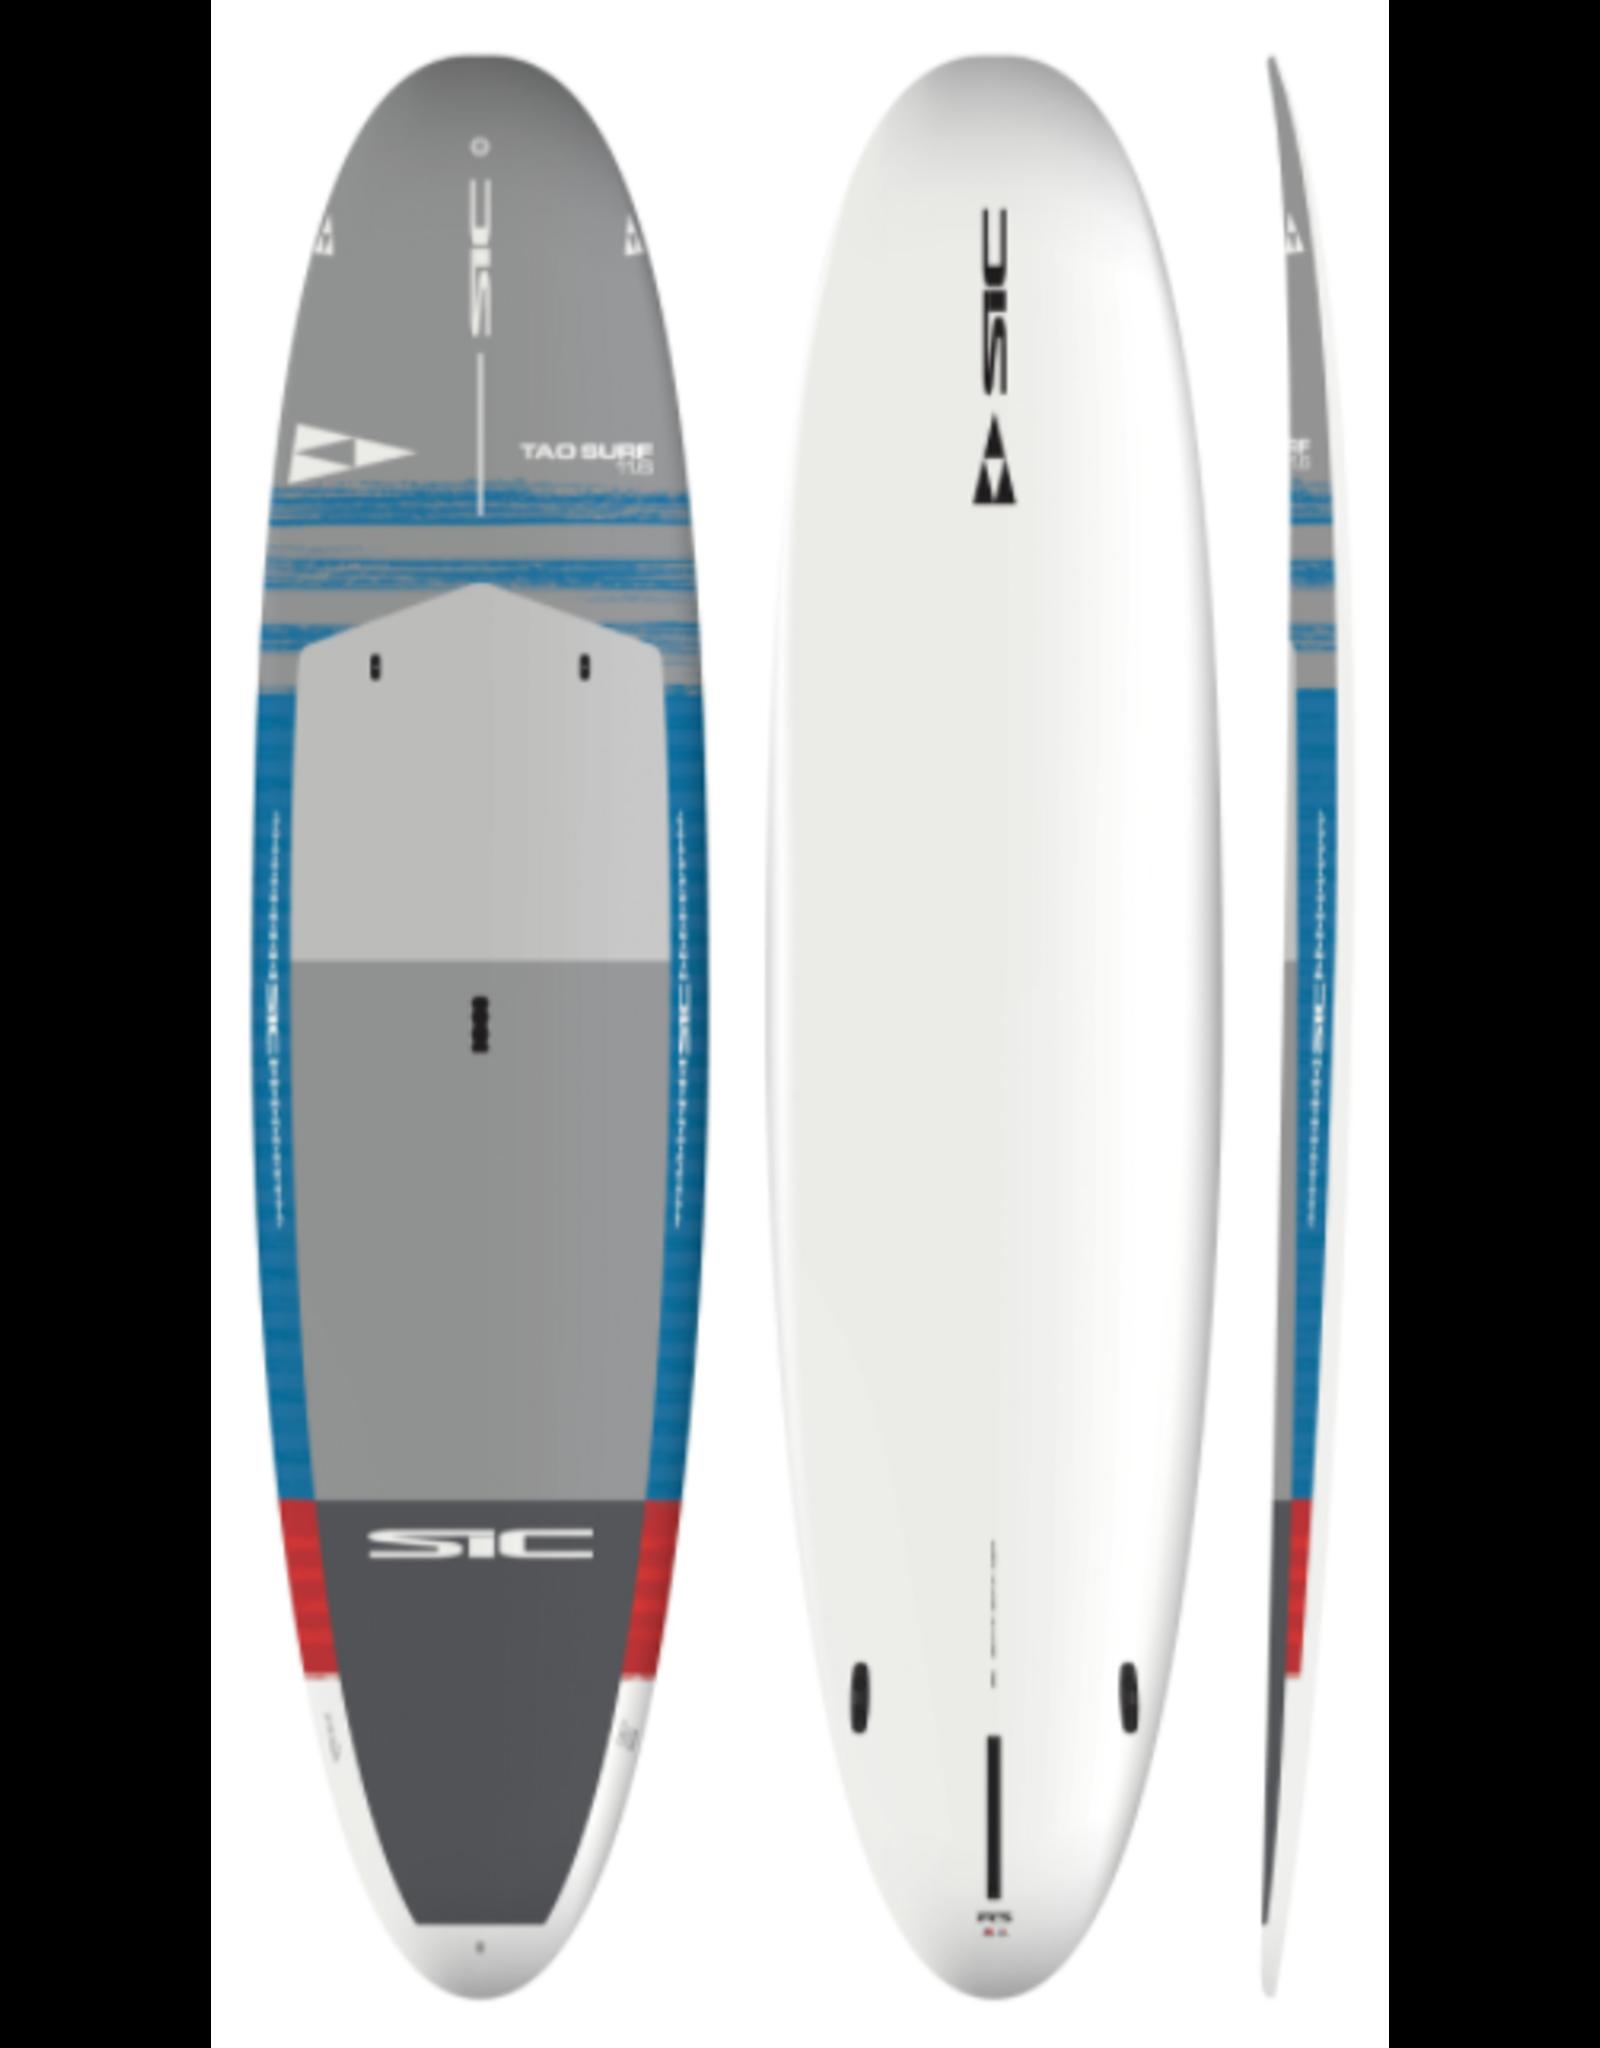 SIC Maui SIC SUP Tao Surf 11.6'